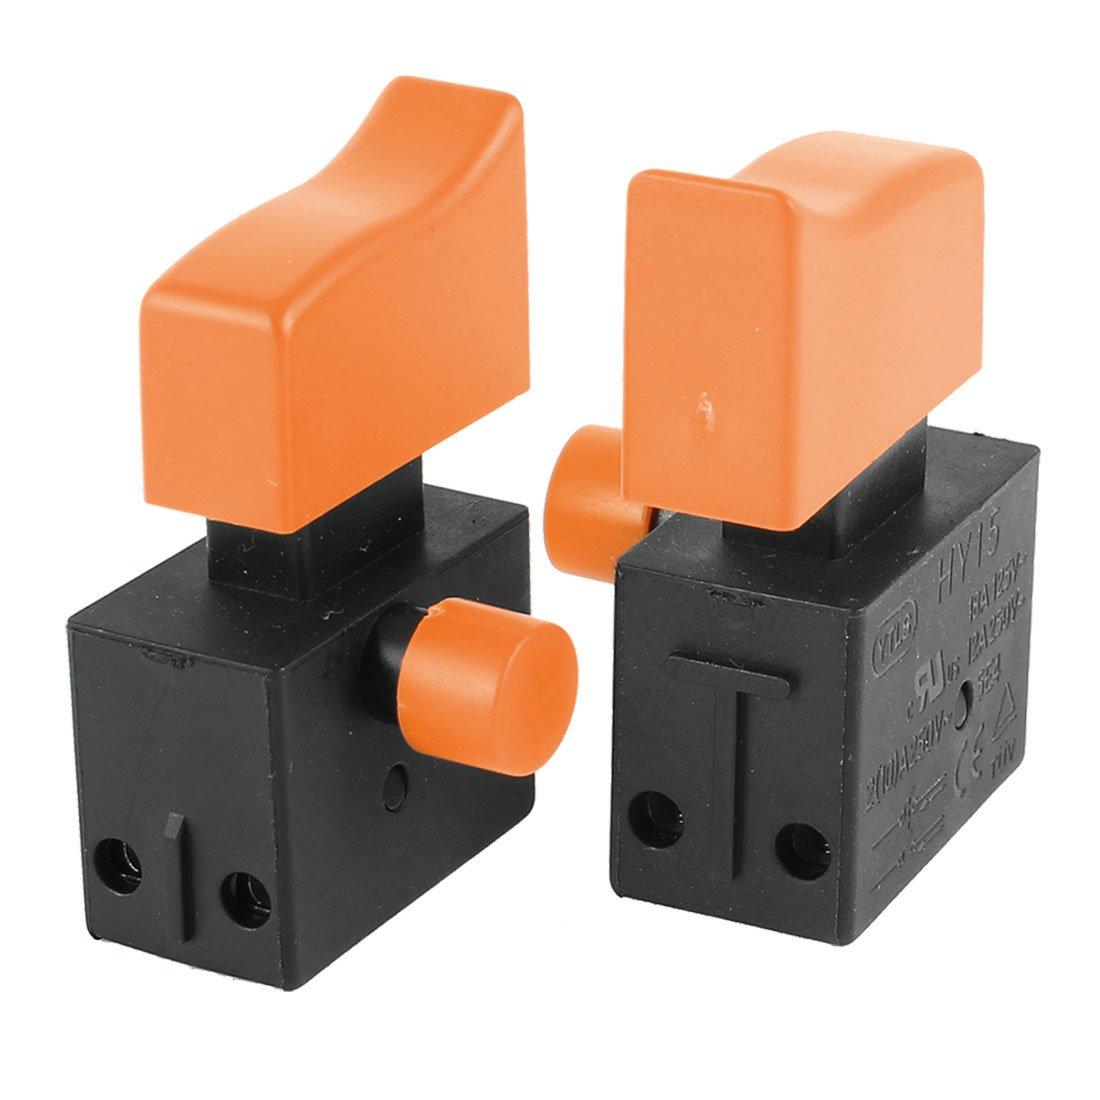 2 Pcs HY15 Latching NO+NO DPST Switch 18A 125V 12A/2A/10A 250V AC